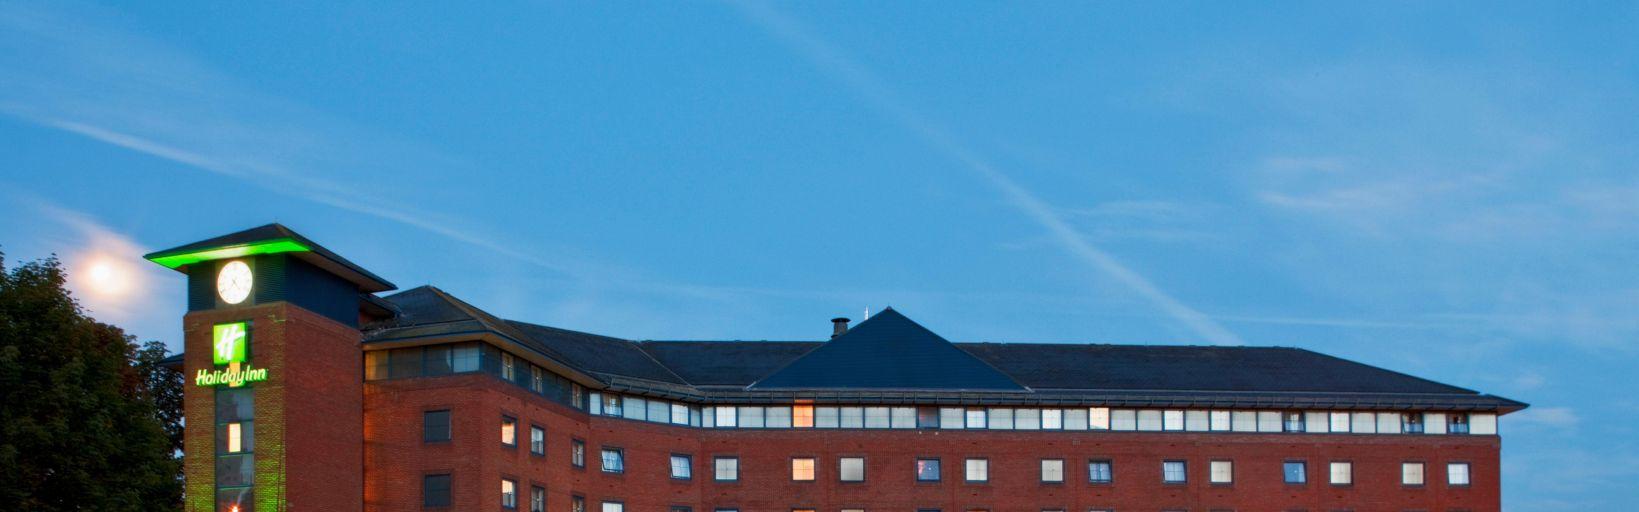 Evening At Holiday Inn London Sutton